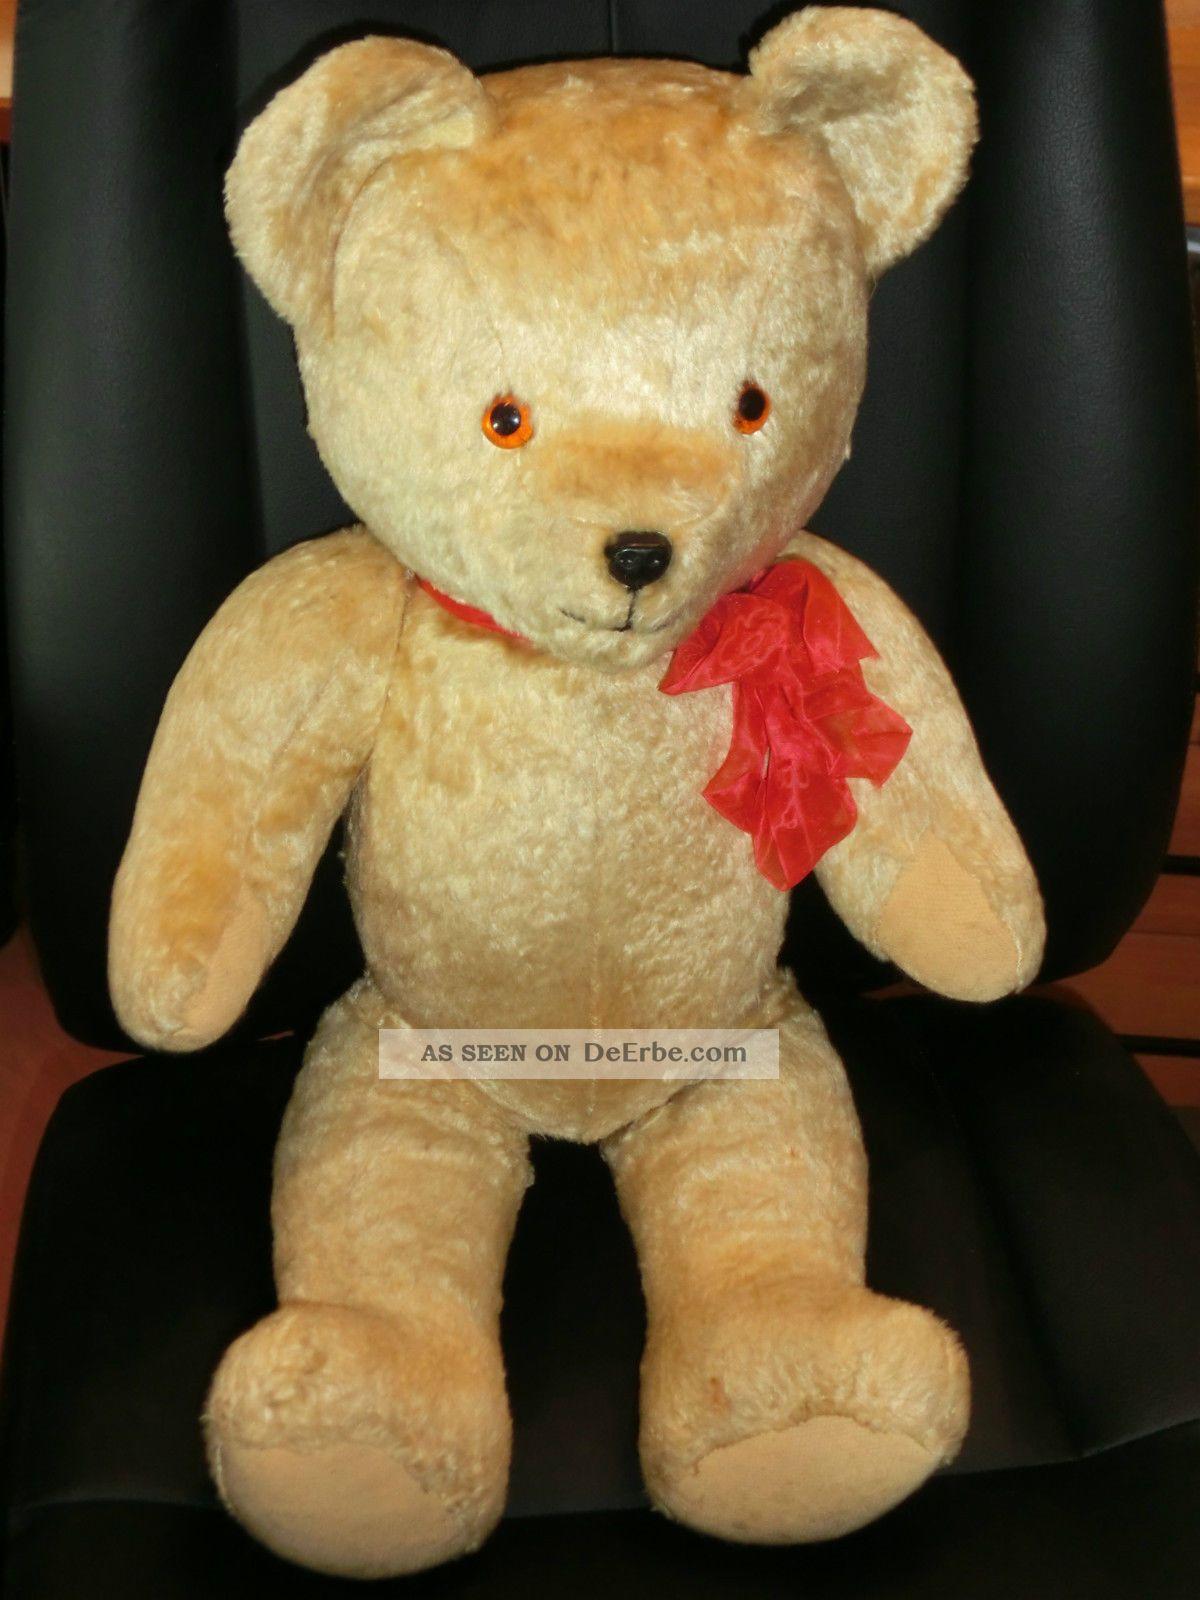 Wunderschöner Grosser Alter Teddy Alt / Teddybär Antik / Holzwolle Gestopft Stofftiere & Teddybären Bild